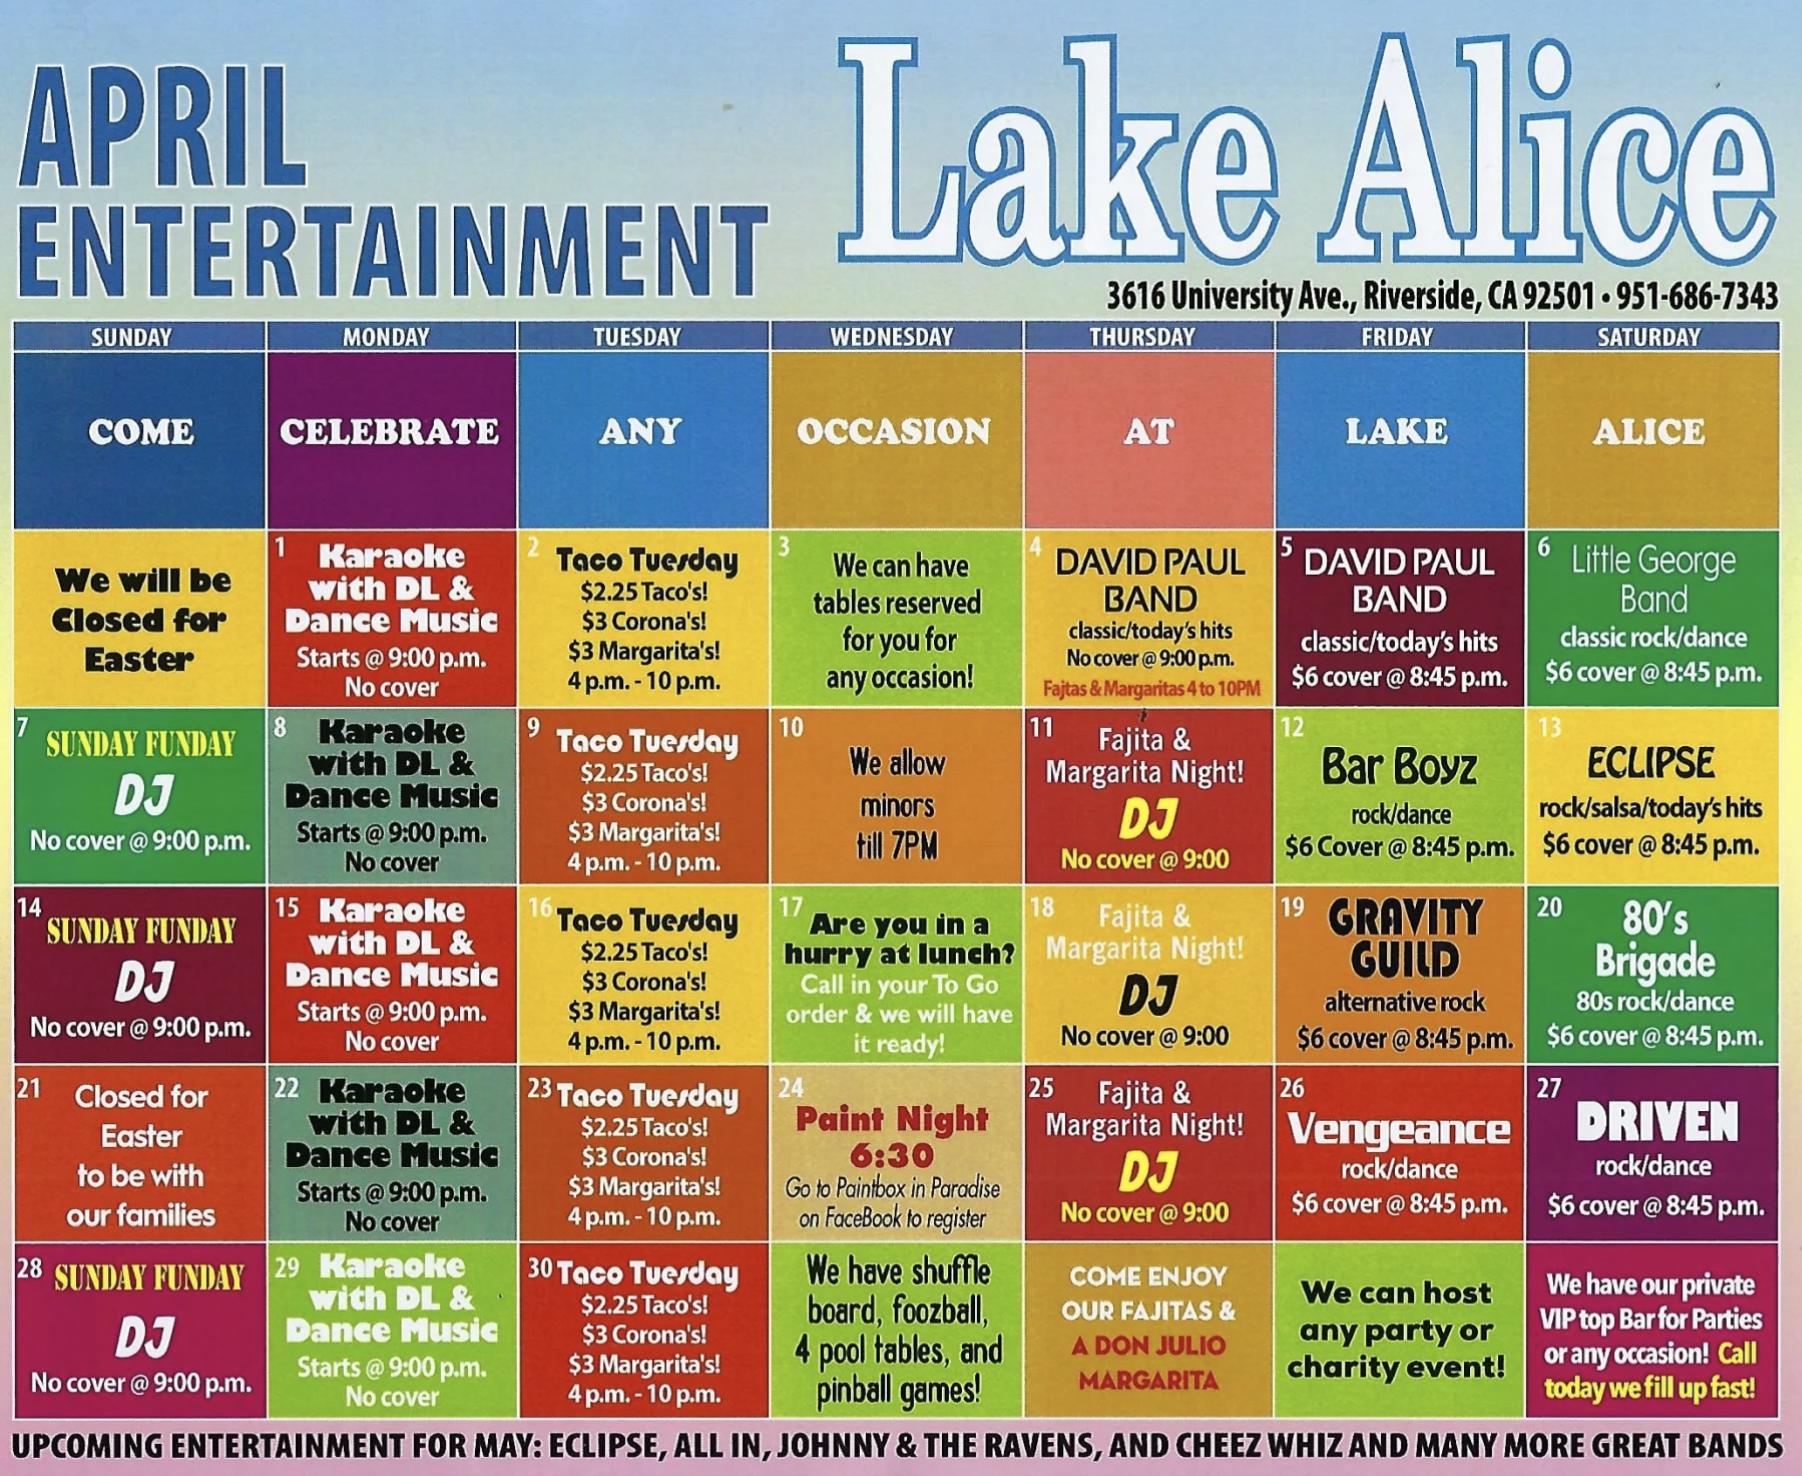 April Calendar - please call (951) 686-7343 for details